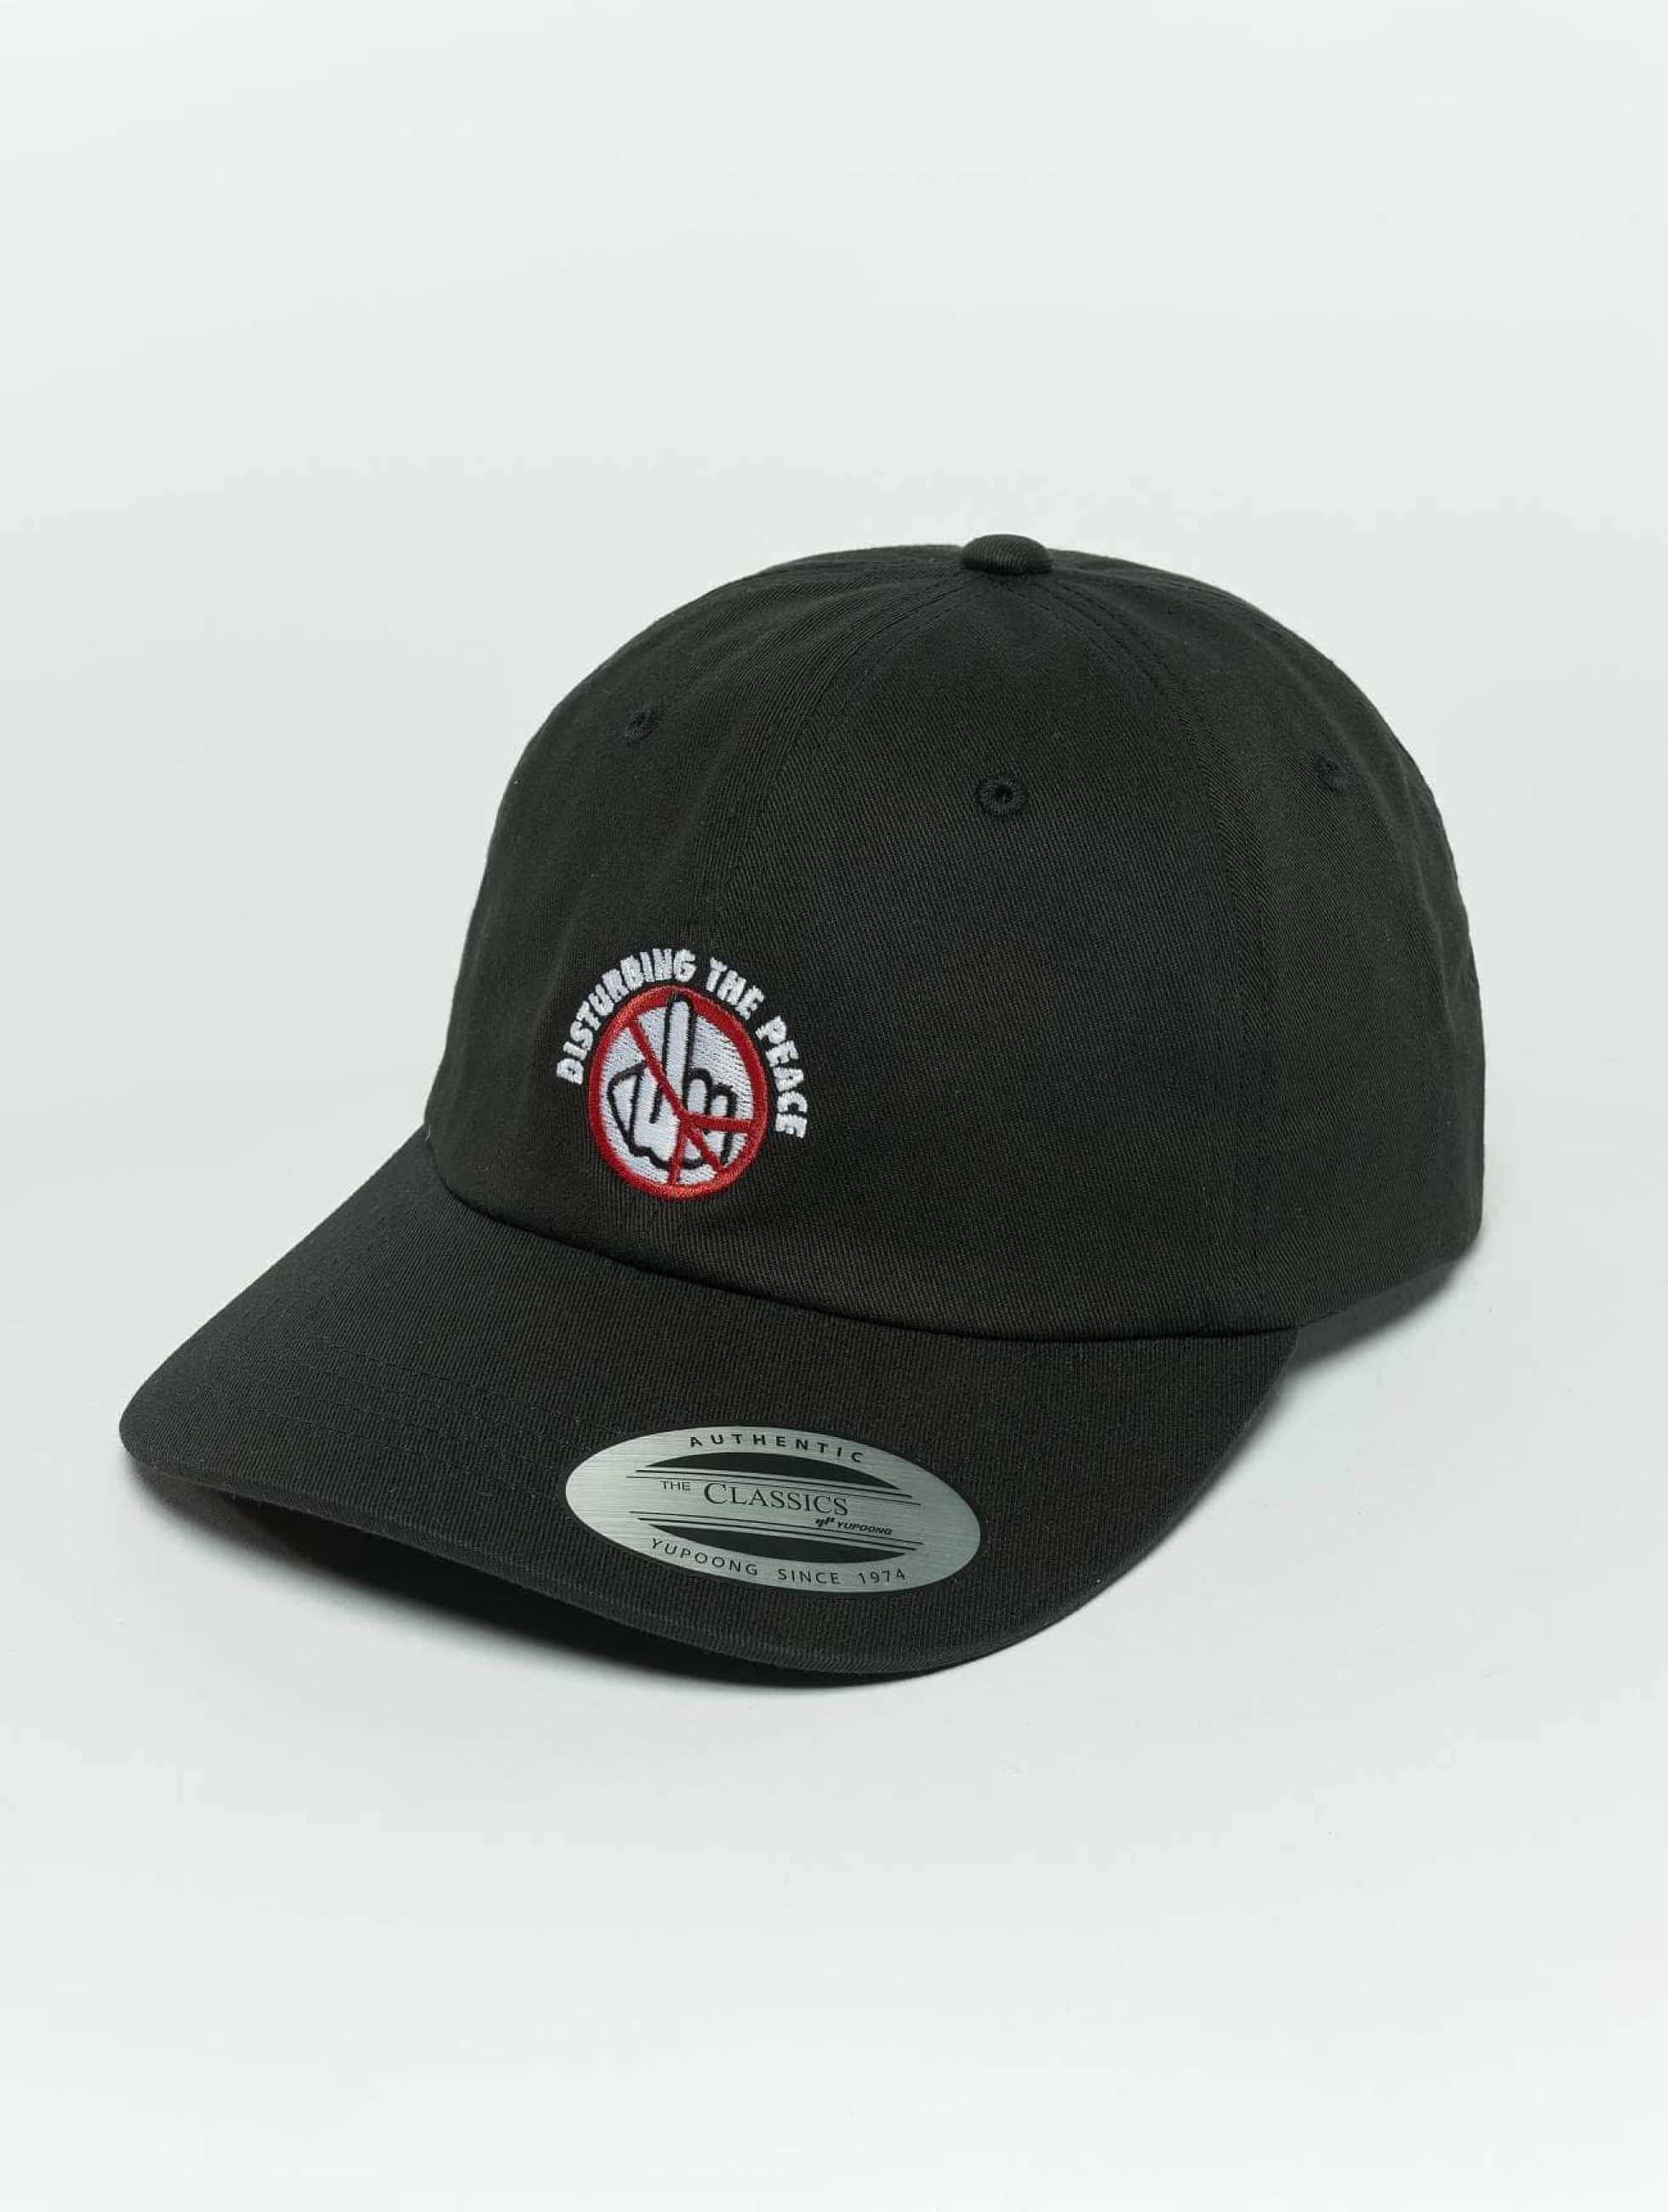 TurnUP Snapback Caps Disturbing svart